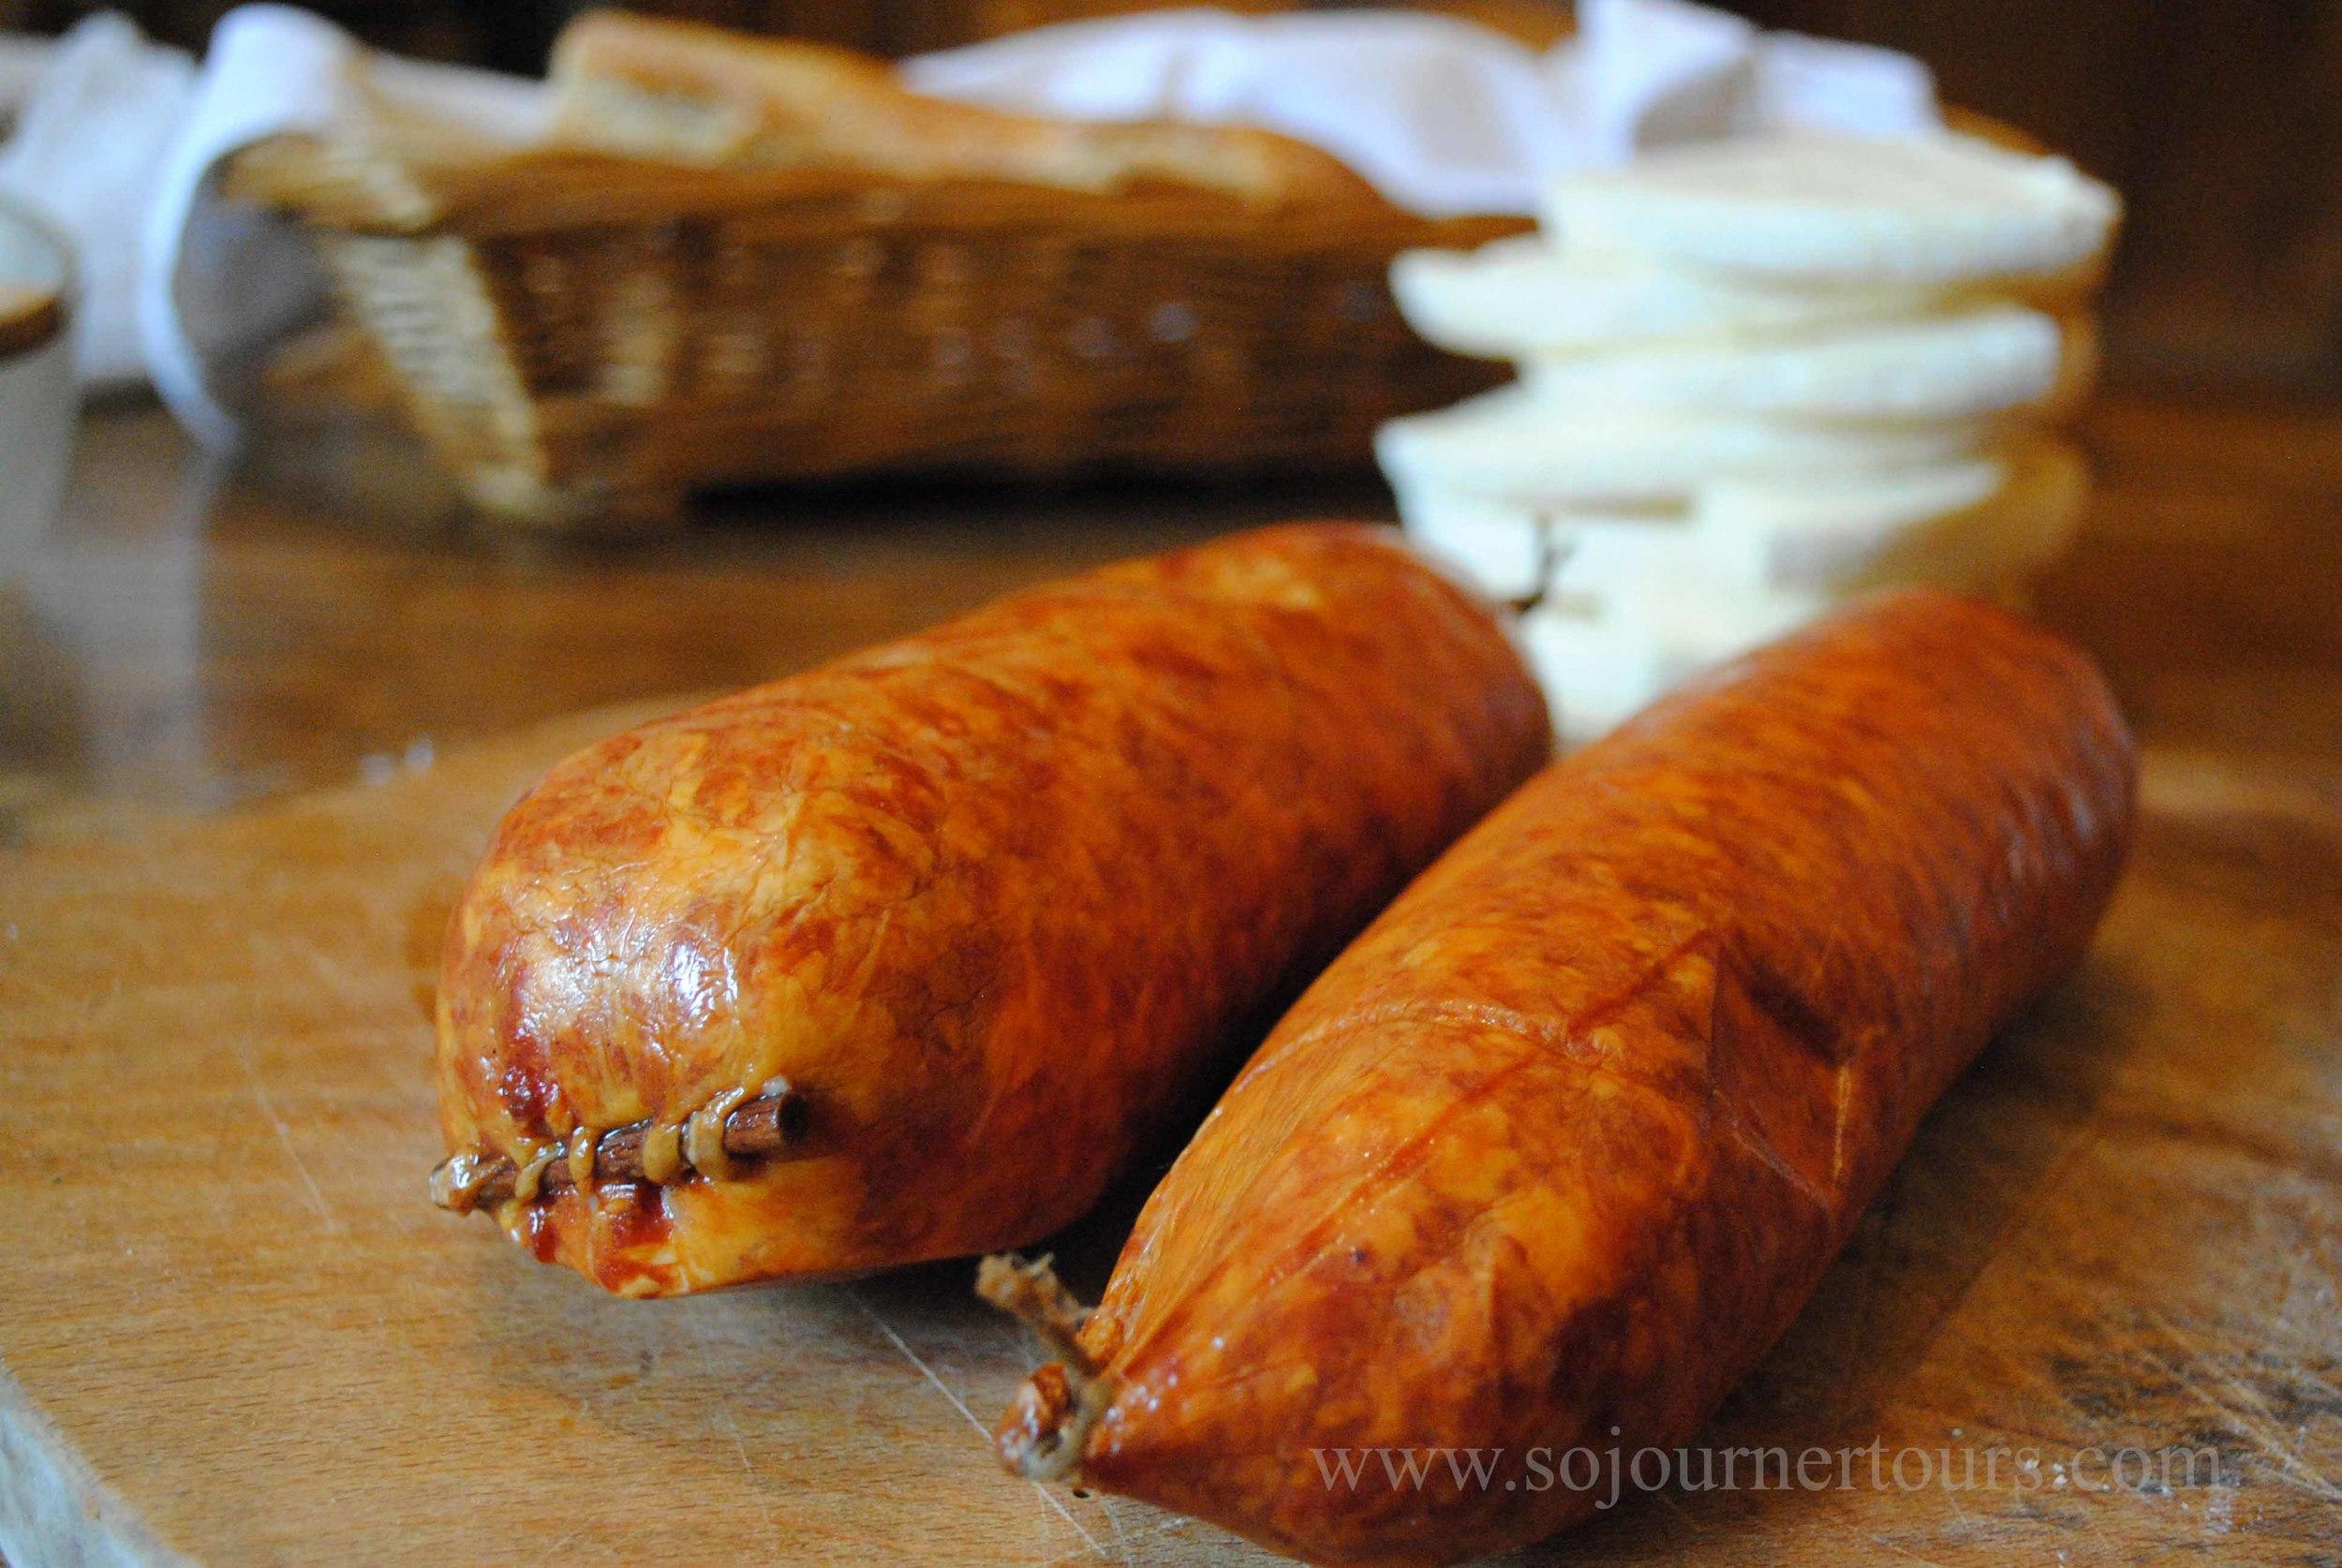 Sausage Franche-Comté, France (Sojourner Tours)